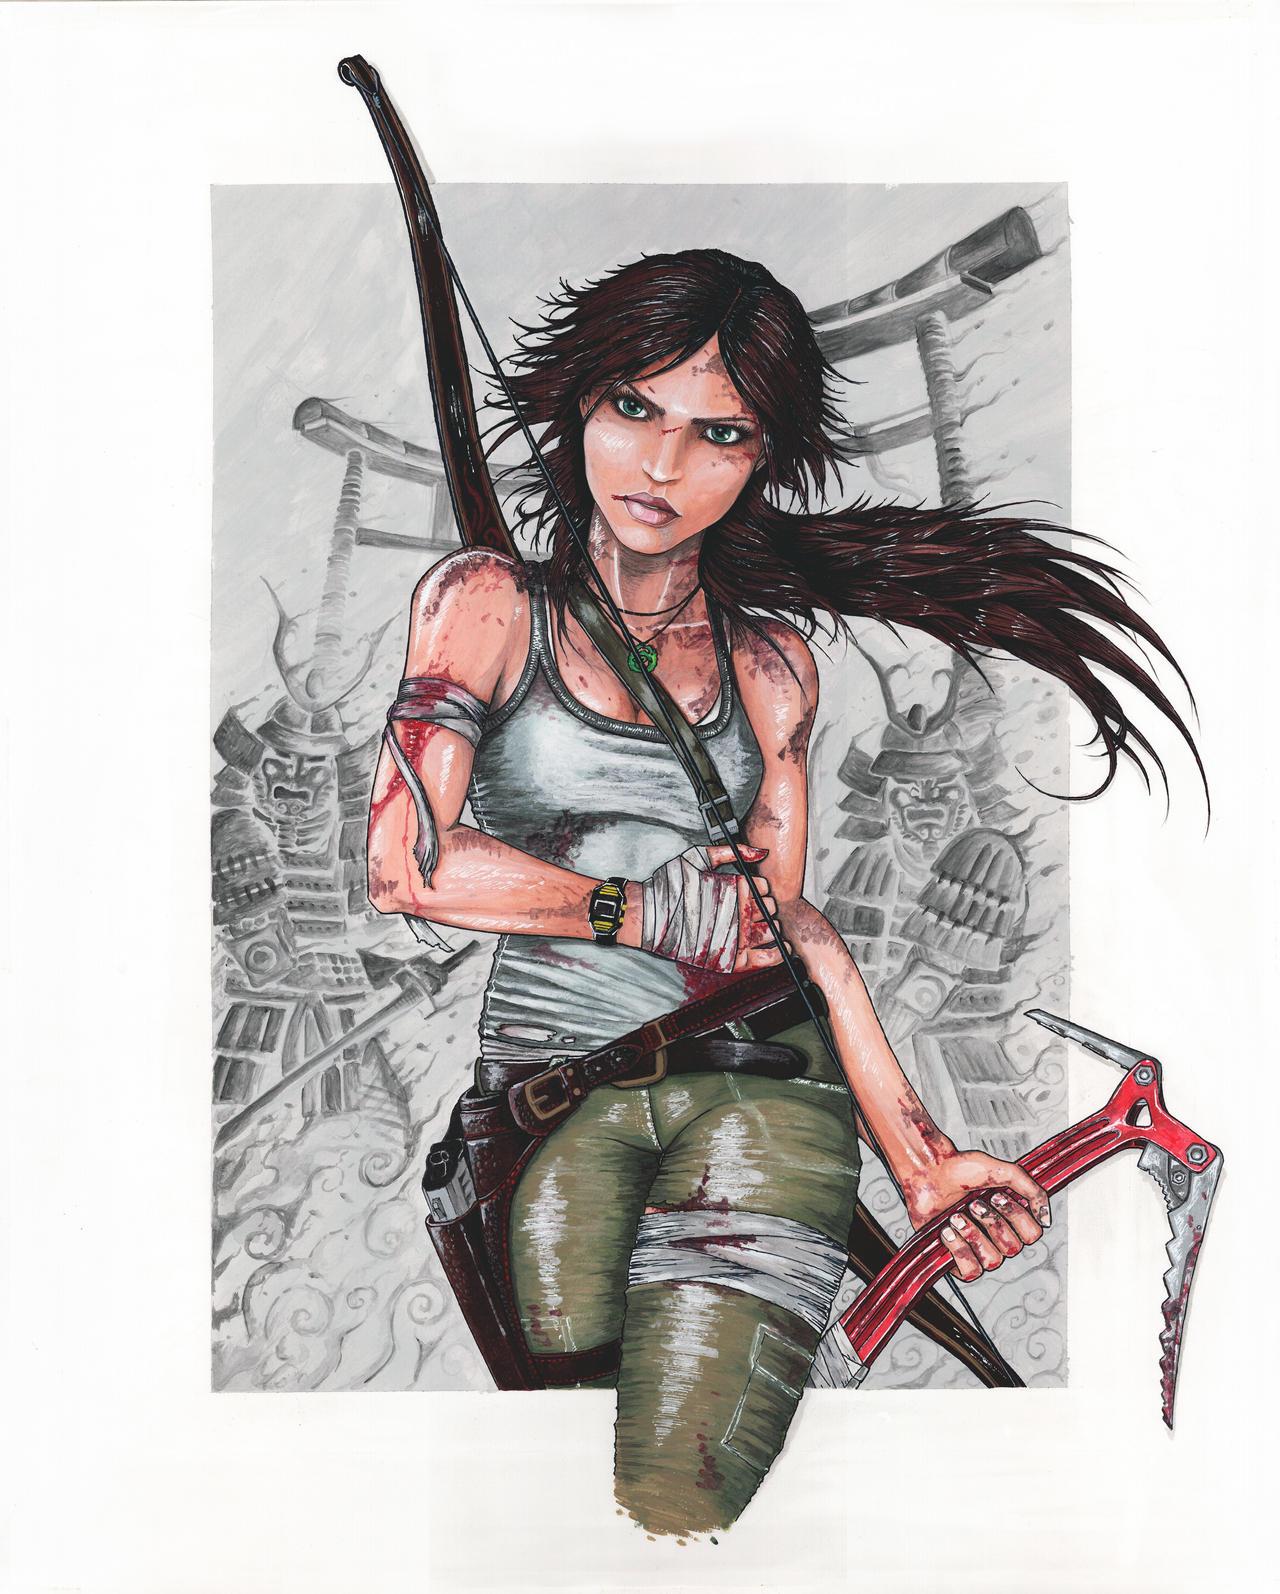 Tomb Raider 2013 Wallpaper: Lara Croft By DavorIvanec On DeviantArt